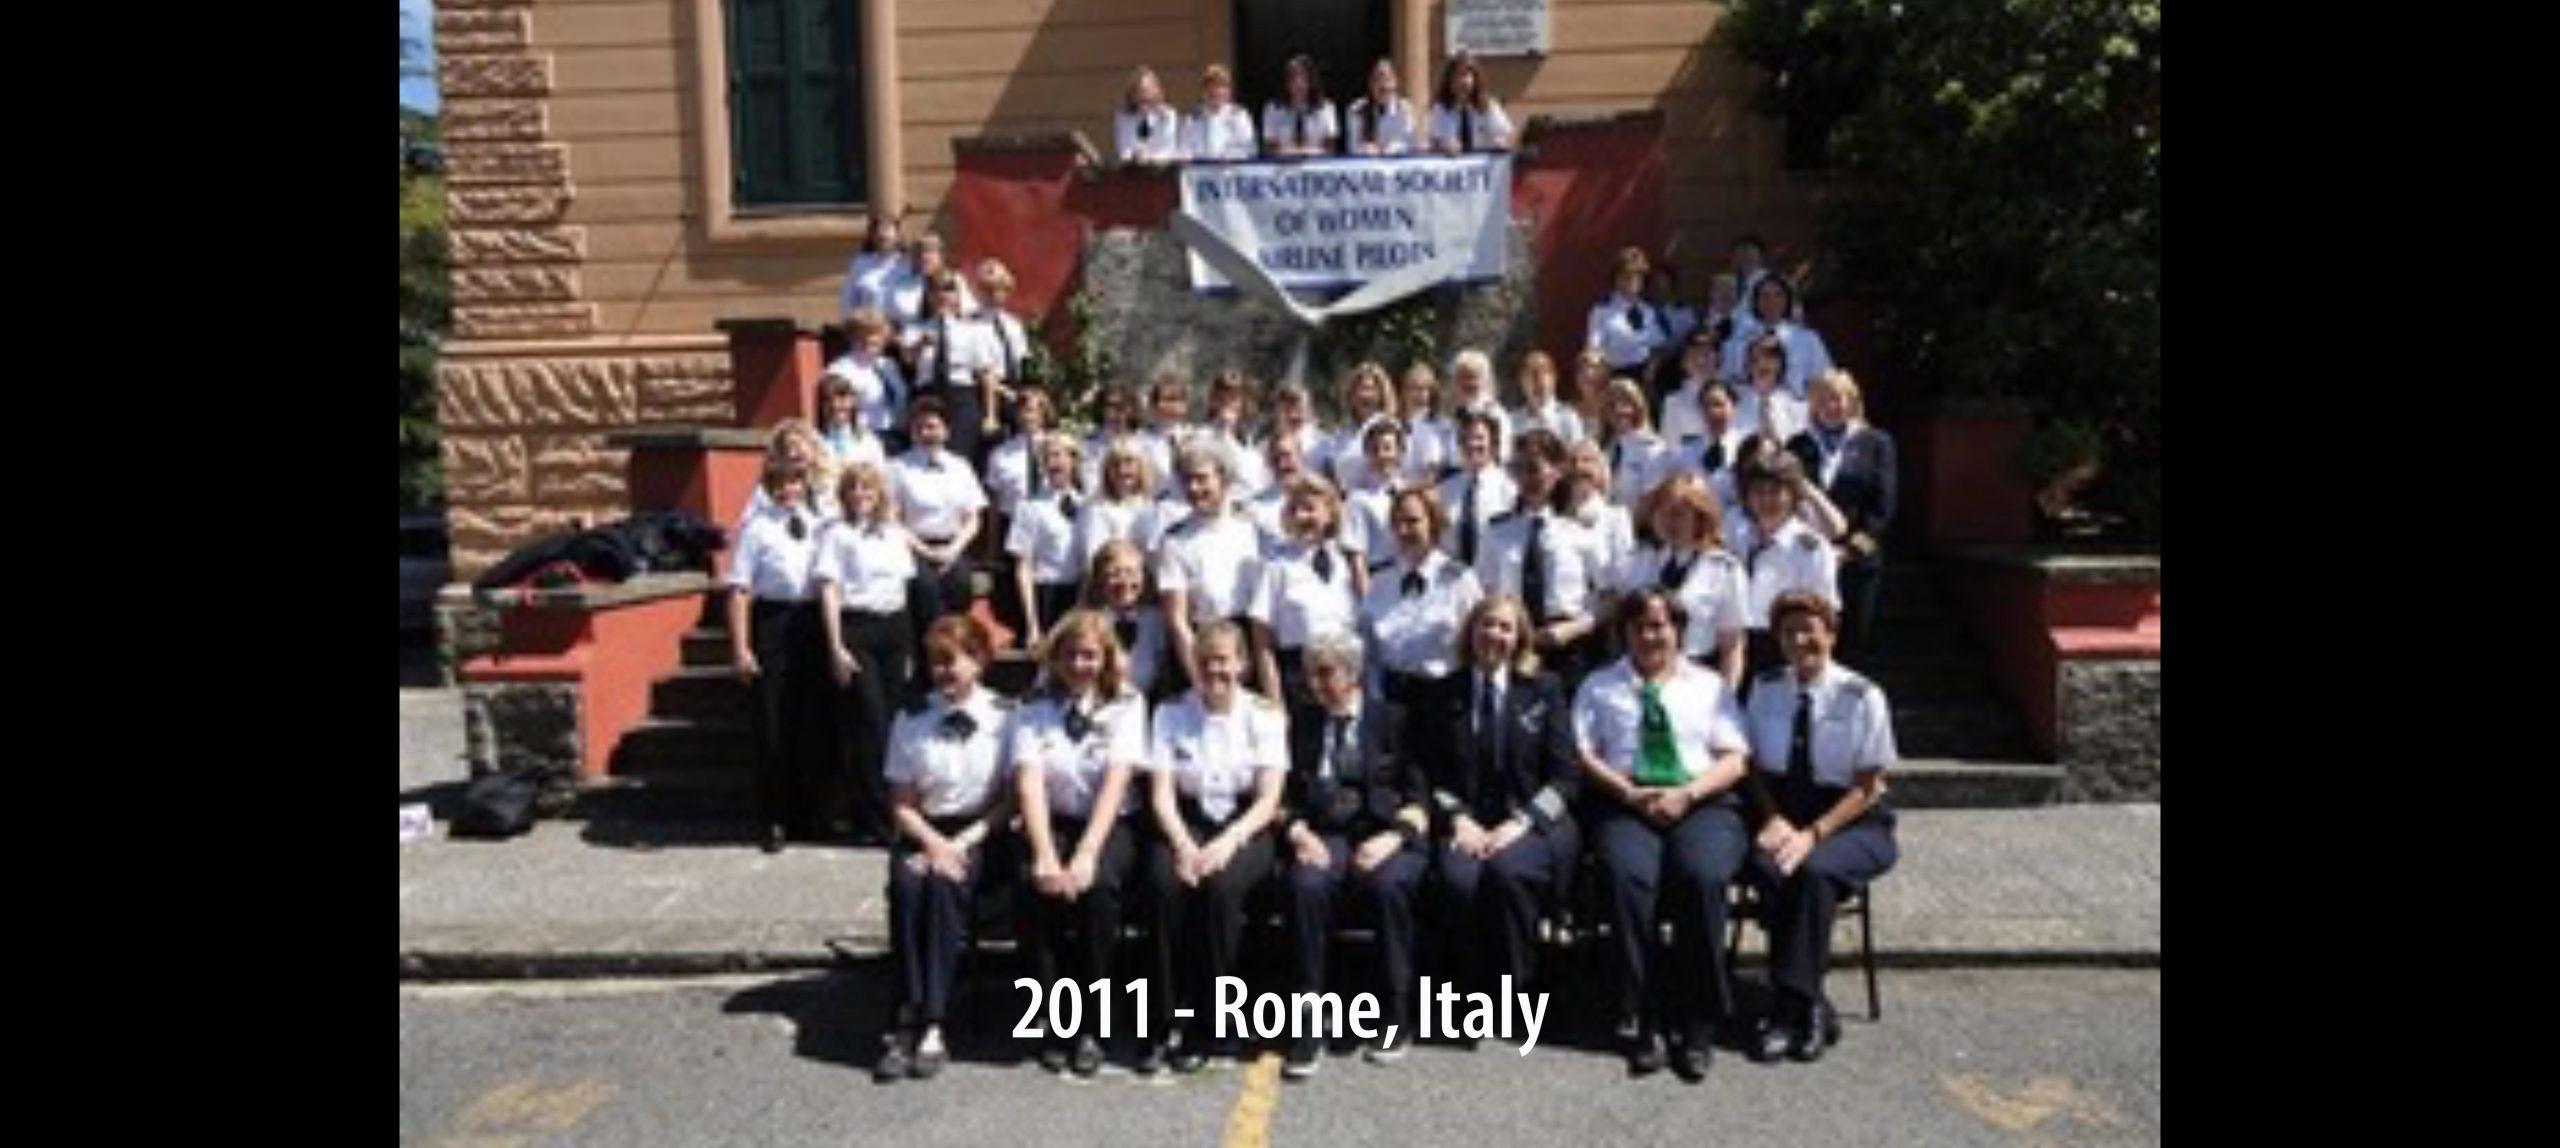 2011x - Rome